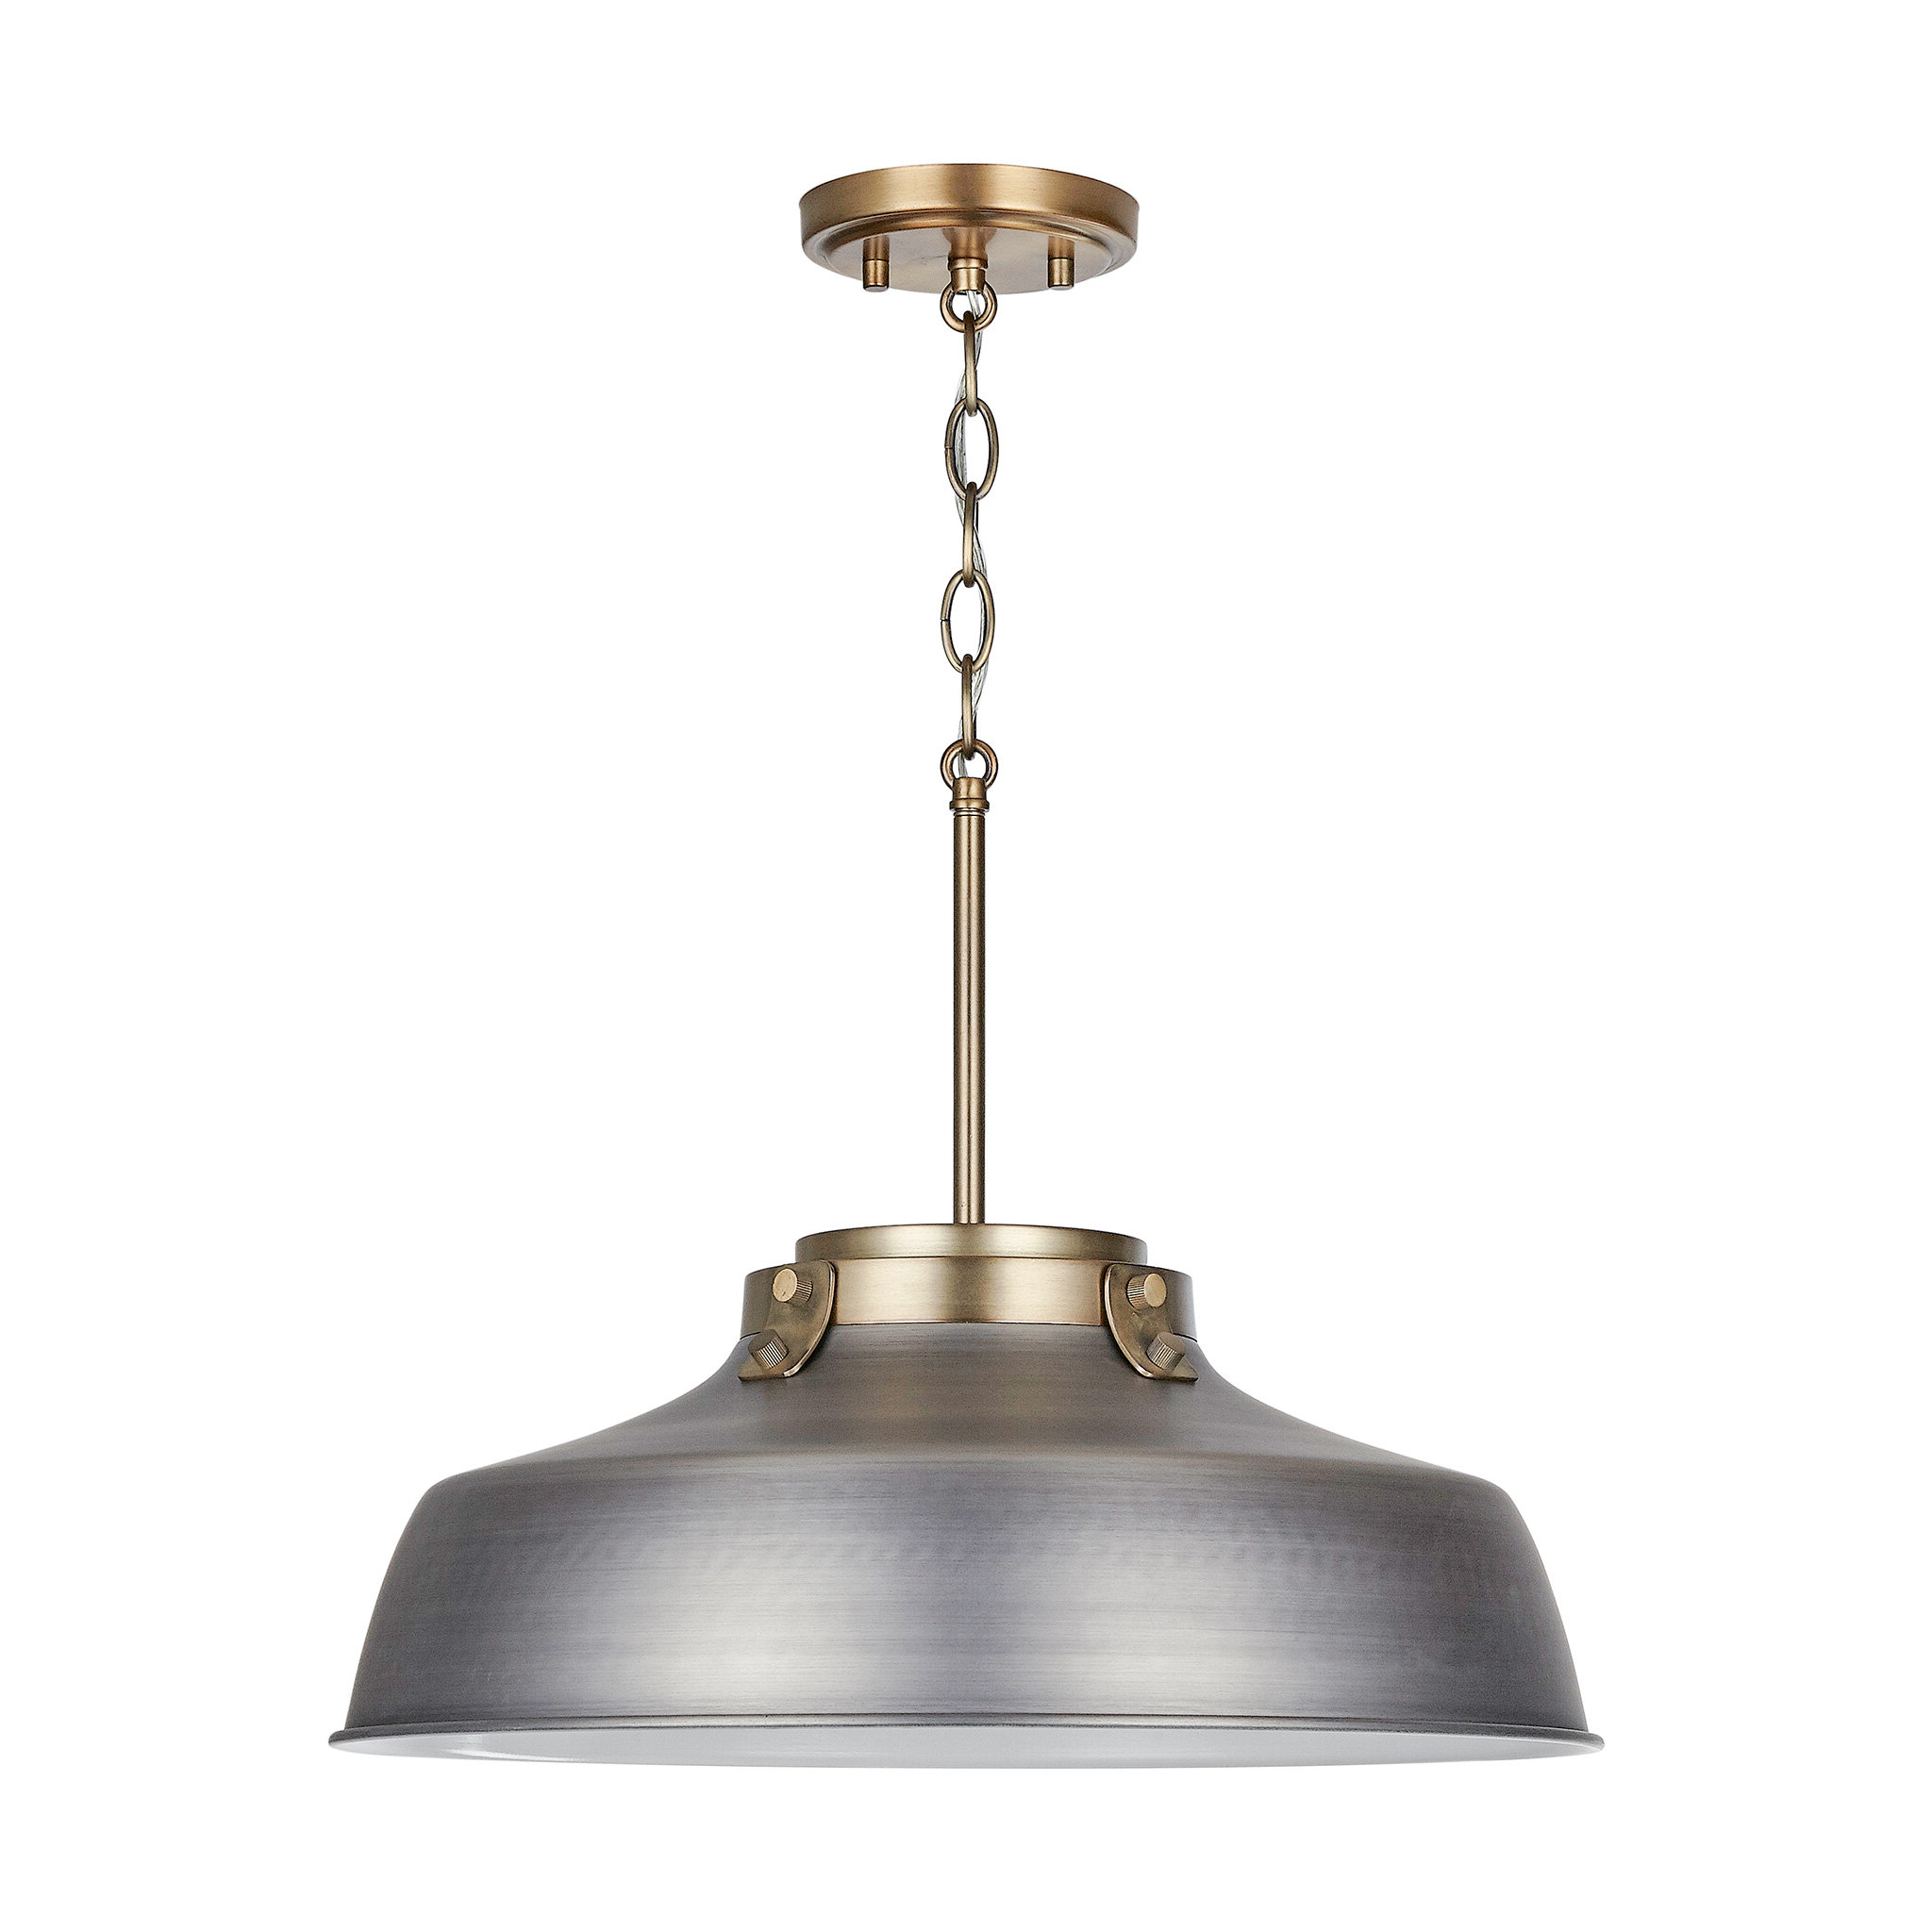 2020 Knoxville 1 Light Single Teardrop Pendants Inside 1 Light Single Dome Pendant (View 17 of 25)